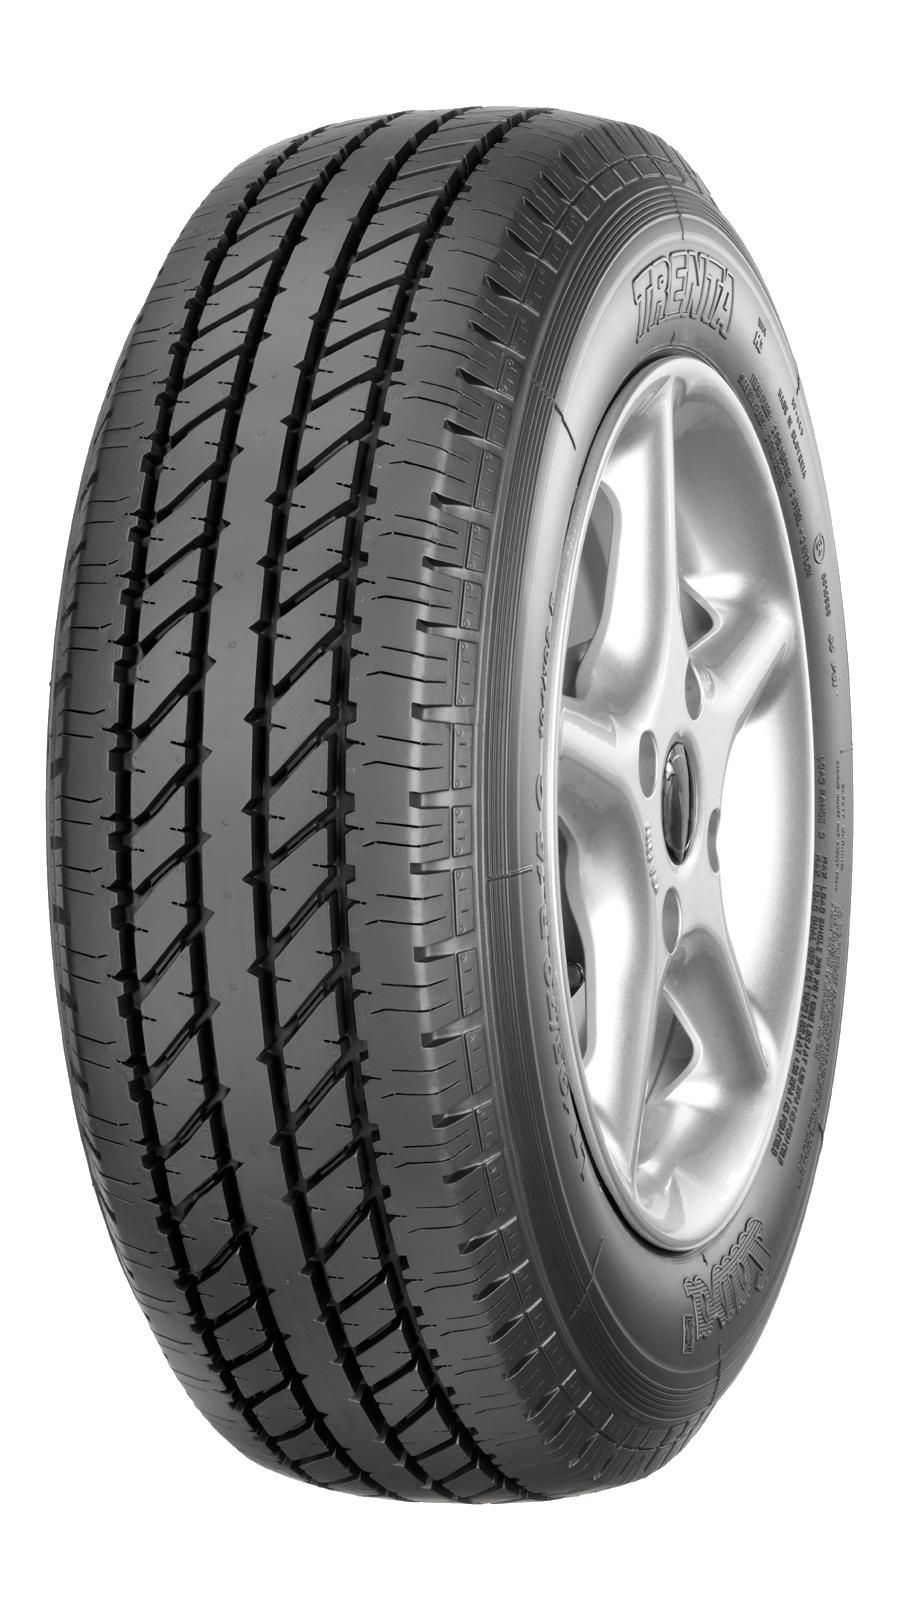 Neumático SAVA TRENTA 205/75R16 110 Q